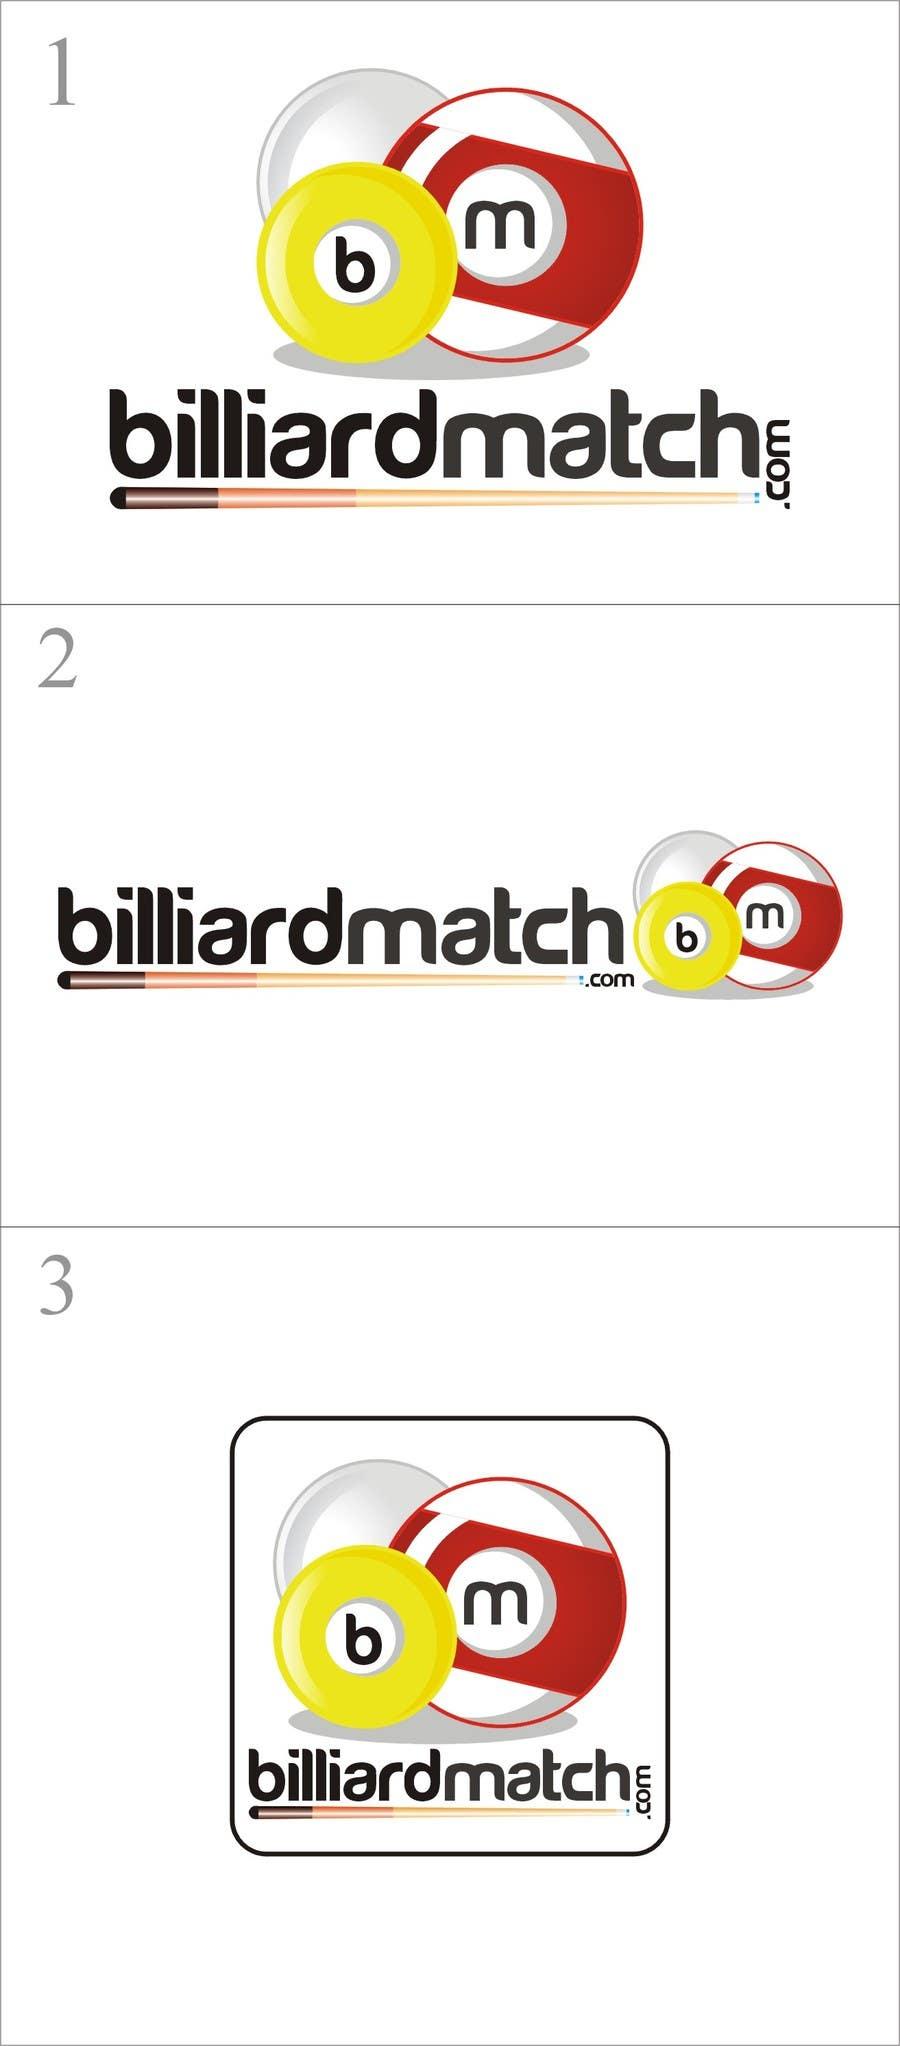 Bài tham dự cuộc thi #                                        28                                      cho                                         Design a Logo for a billiard tournament & score-keeping website.